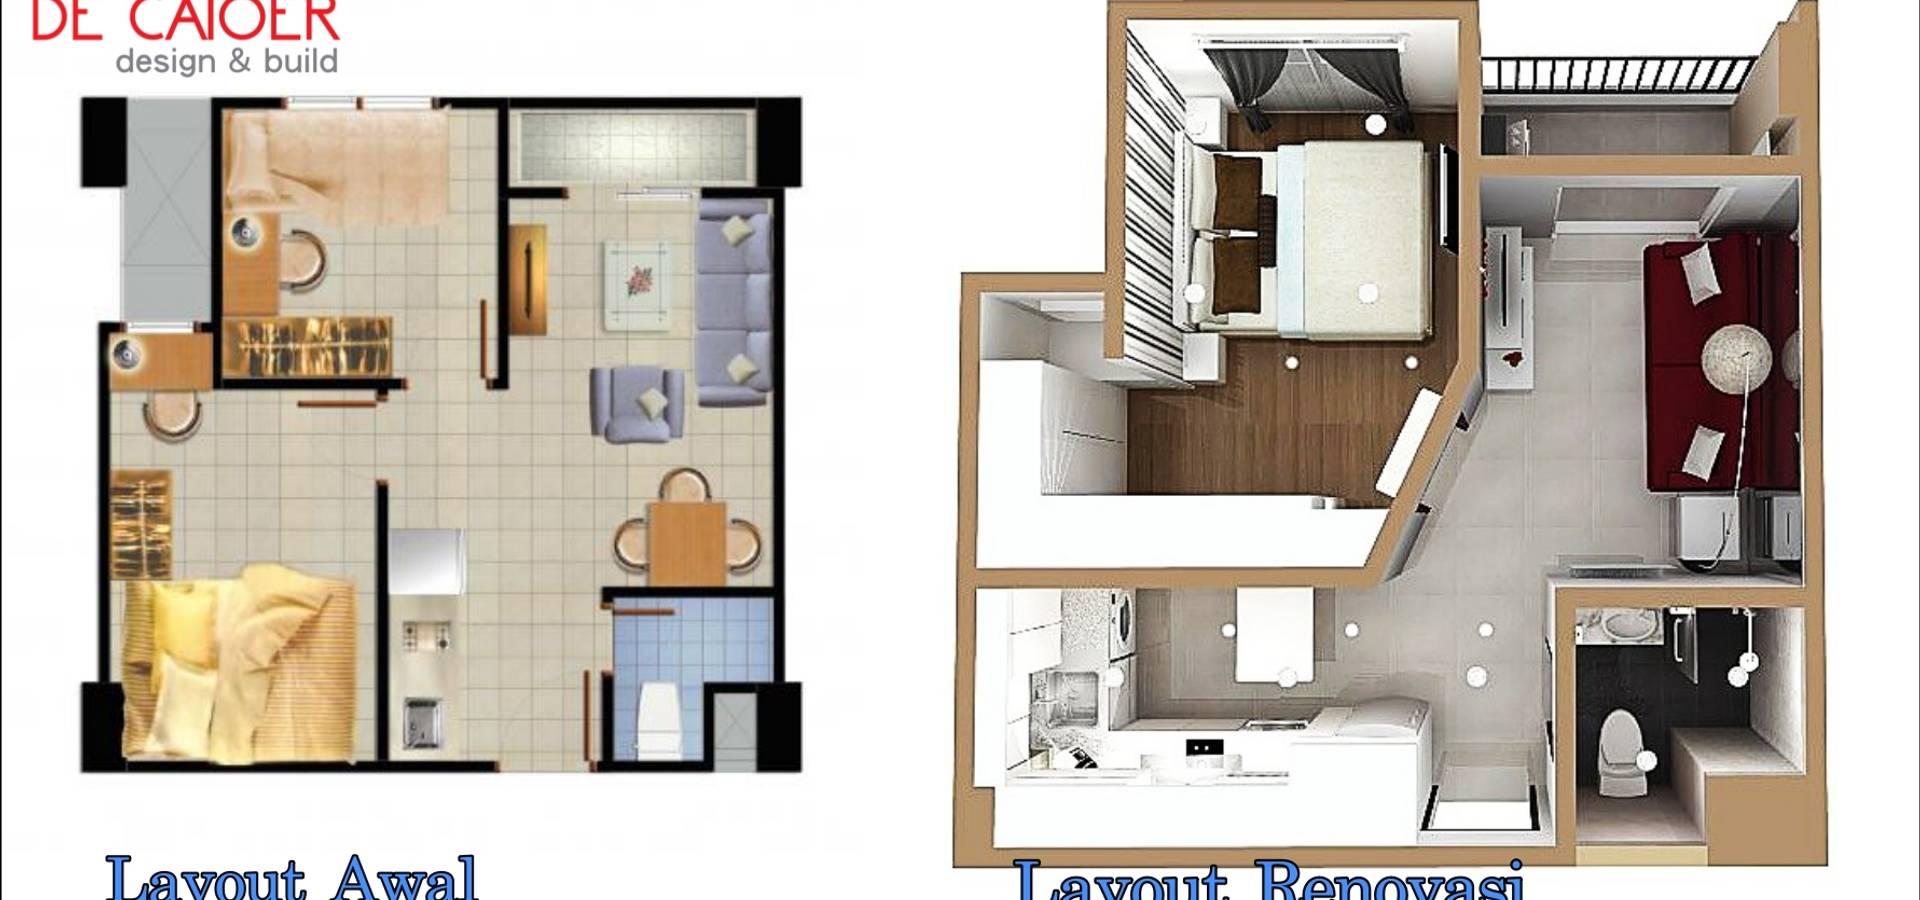 De' Catoer design & build